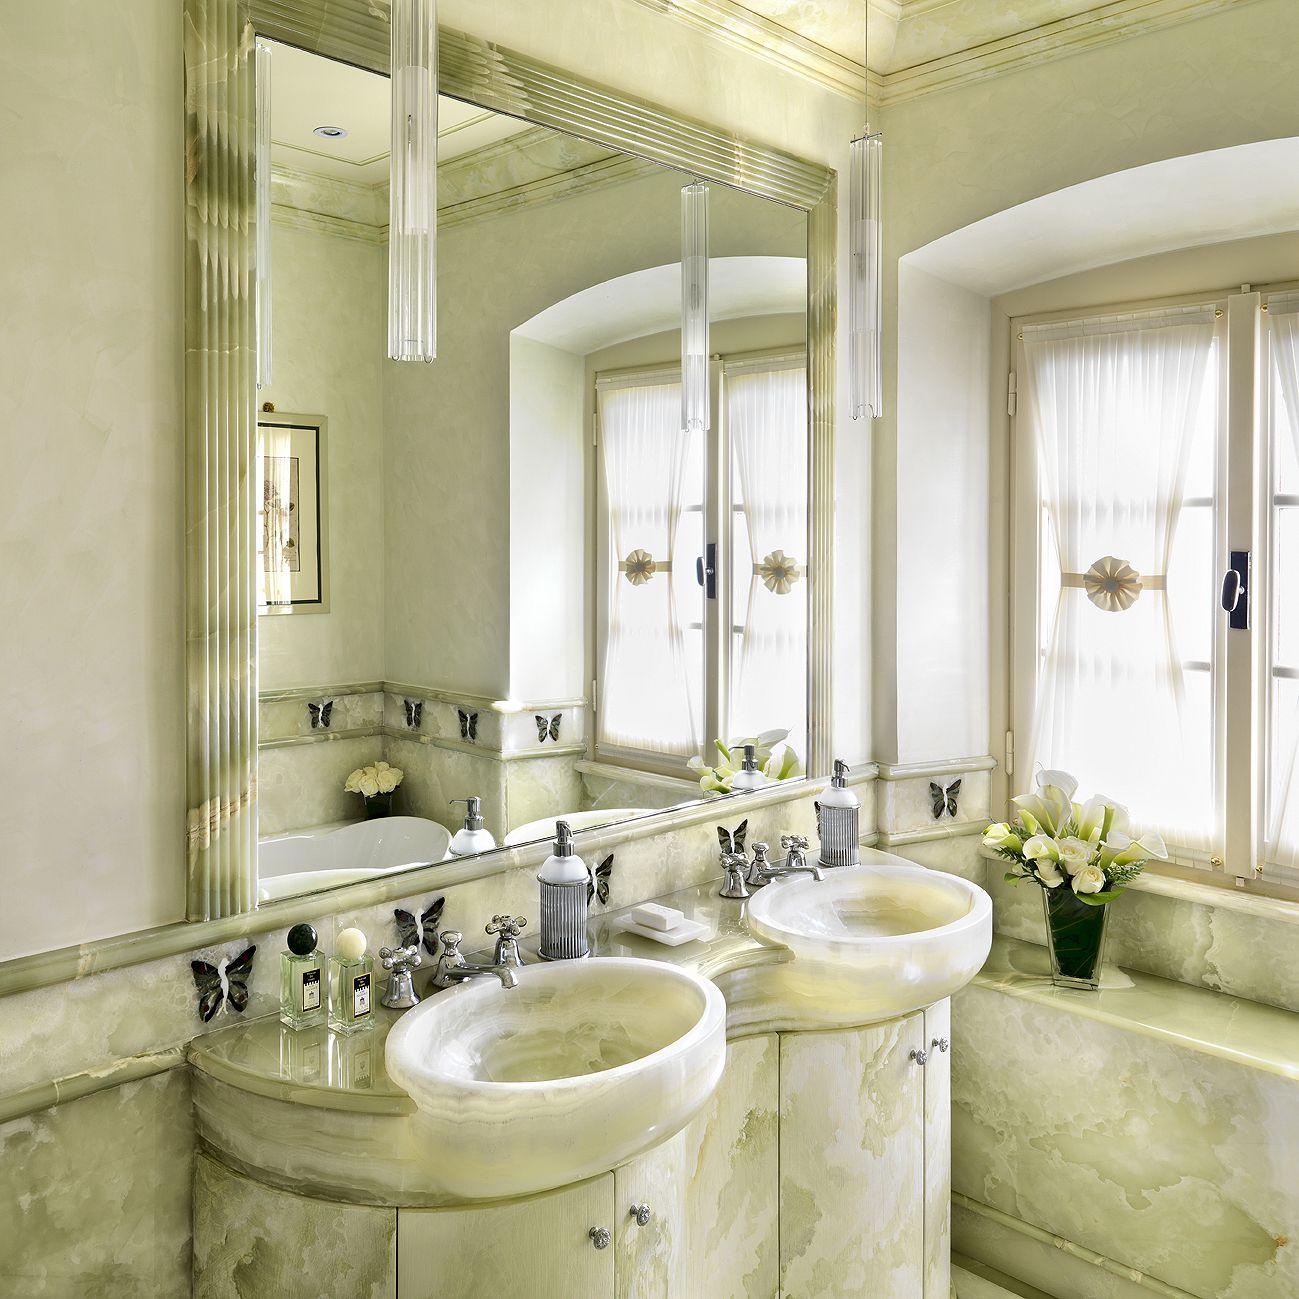 Marbles And Stones Since 1960 Bathroom Interior Design Beautiful Bathrooms Bathroom Design